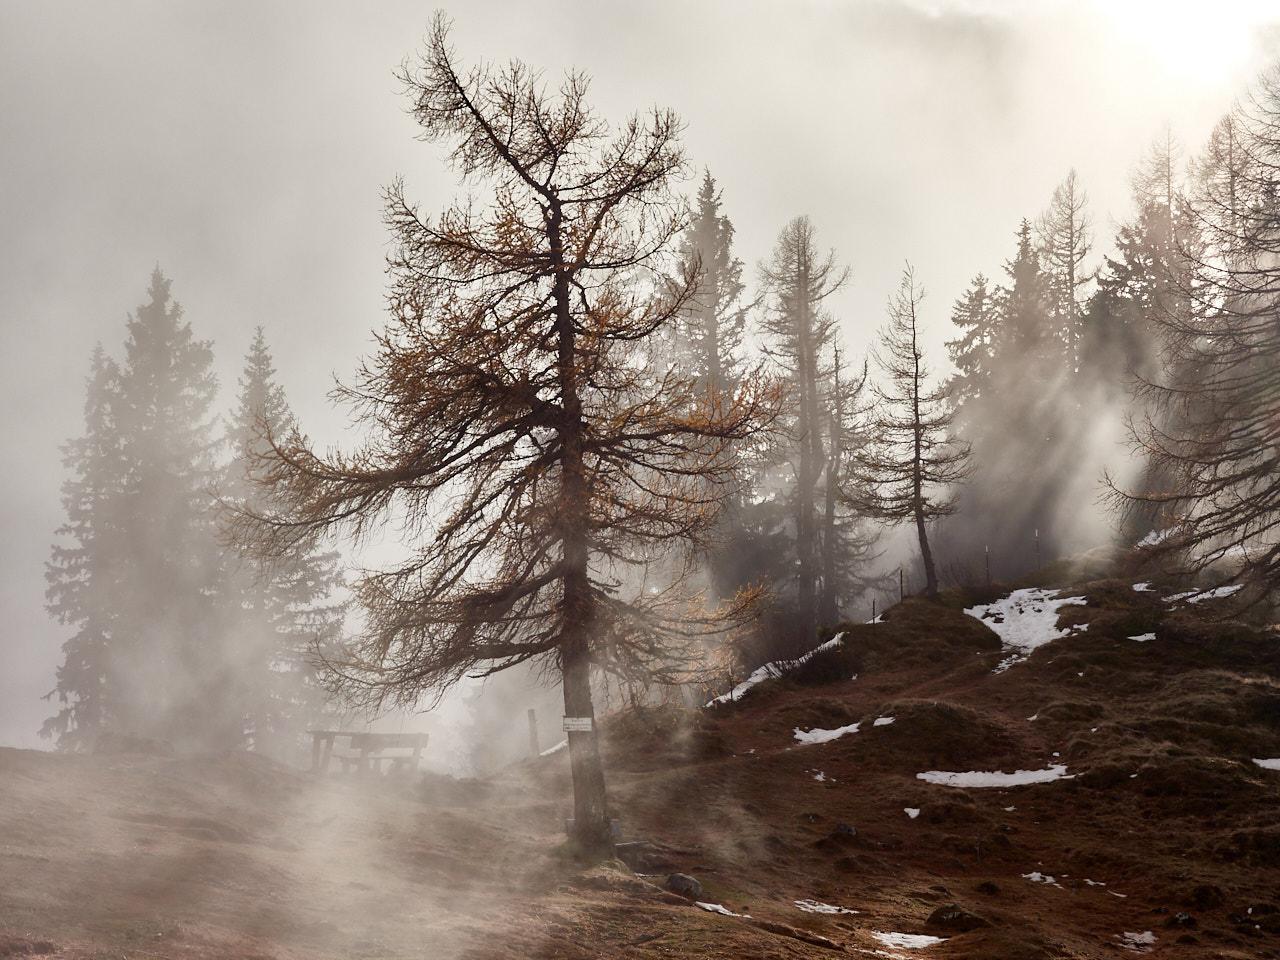 Morning fog in the mountains - Ramsau - Austria